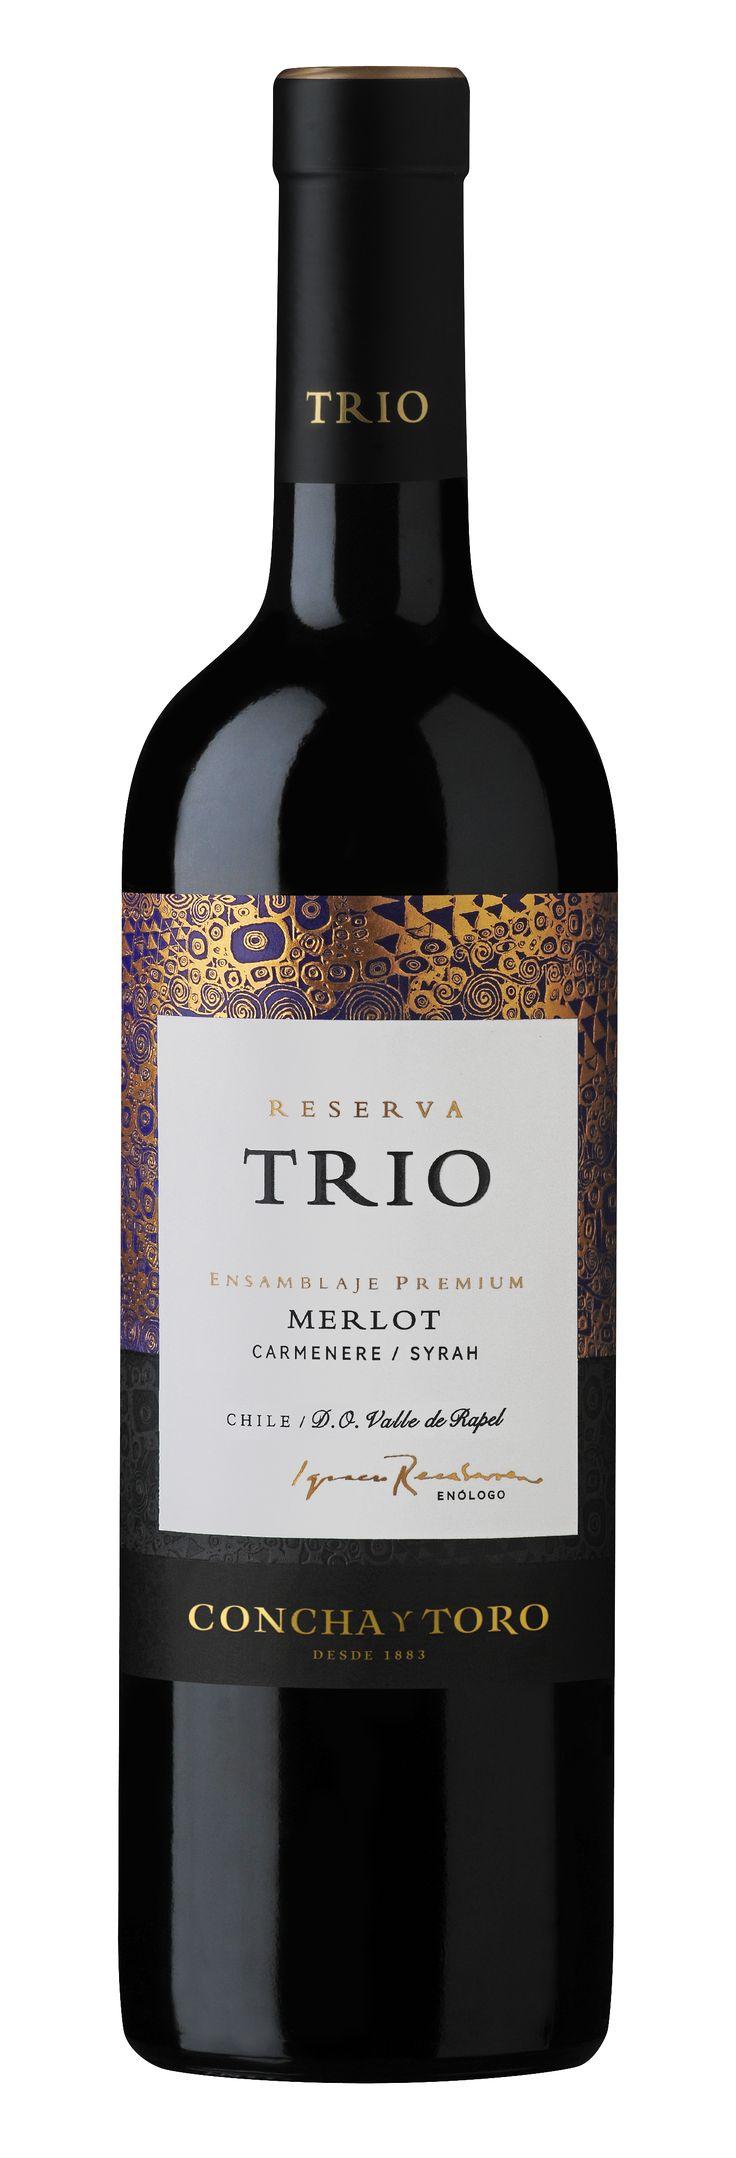 Concha y Toro Trio Argentina Wine